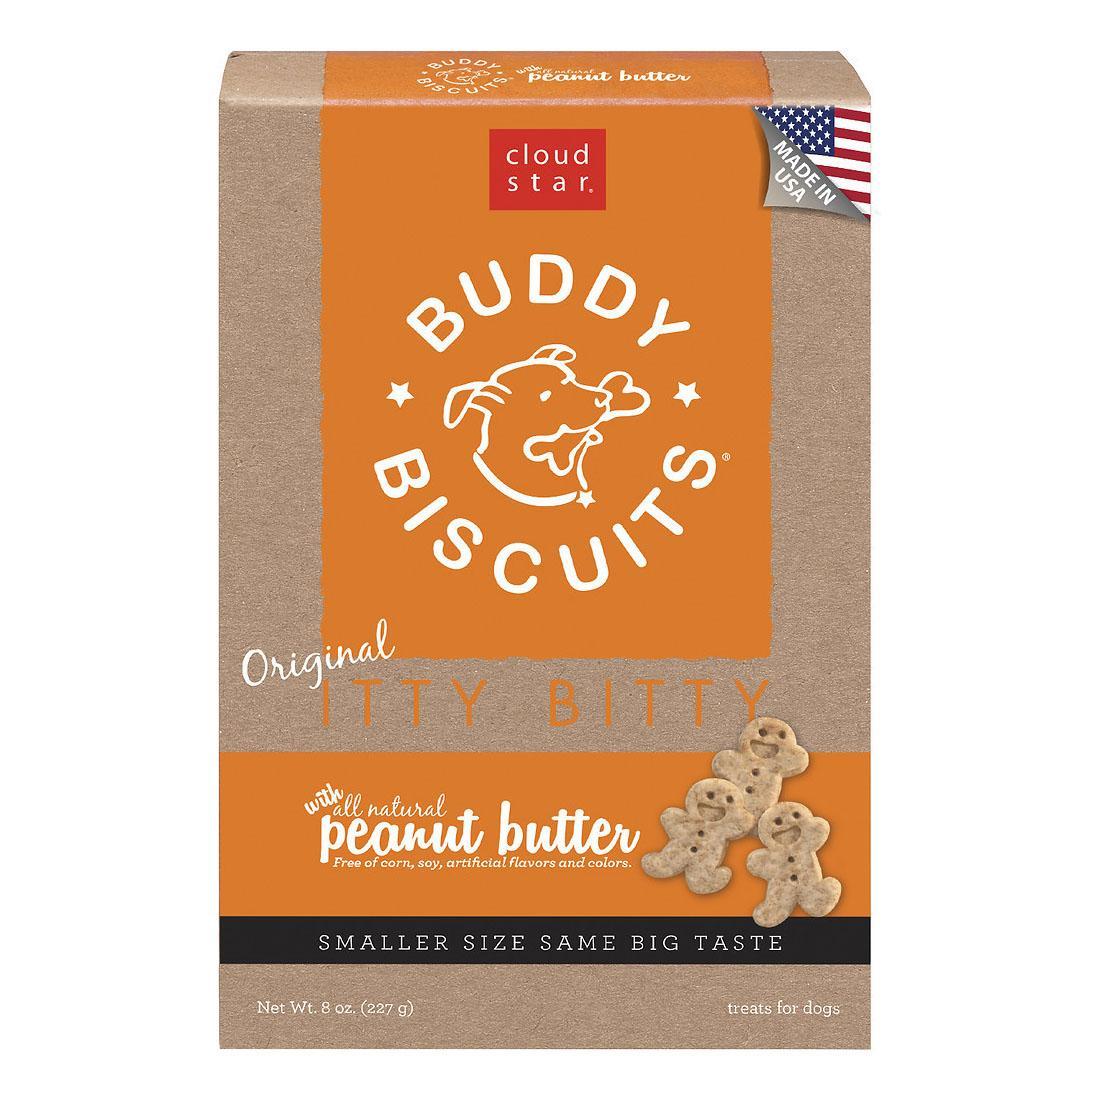 Buddy Biscuits Itty Bitty Dog Treats - Peanut Butter